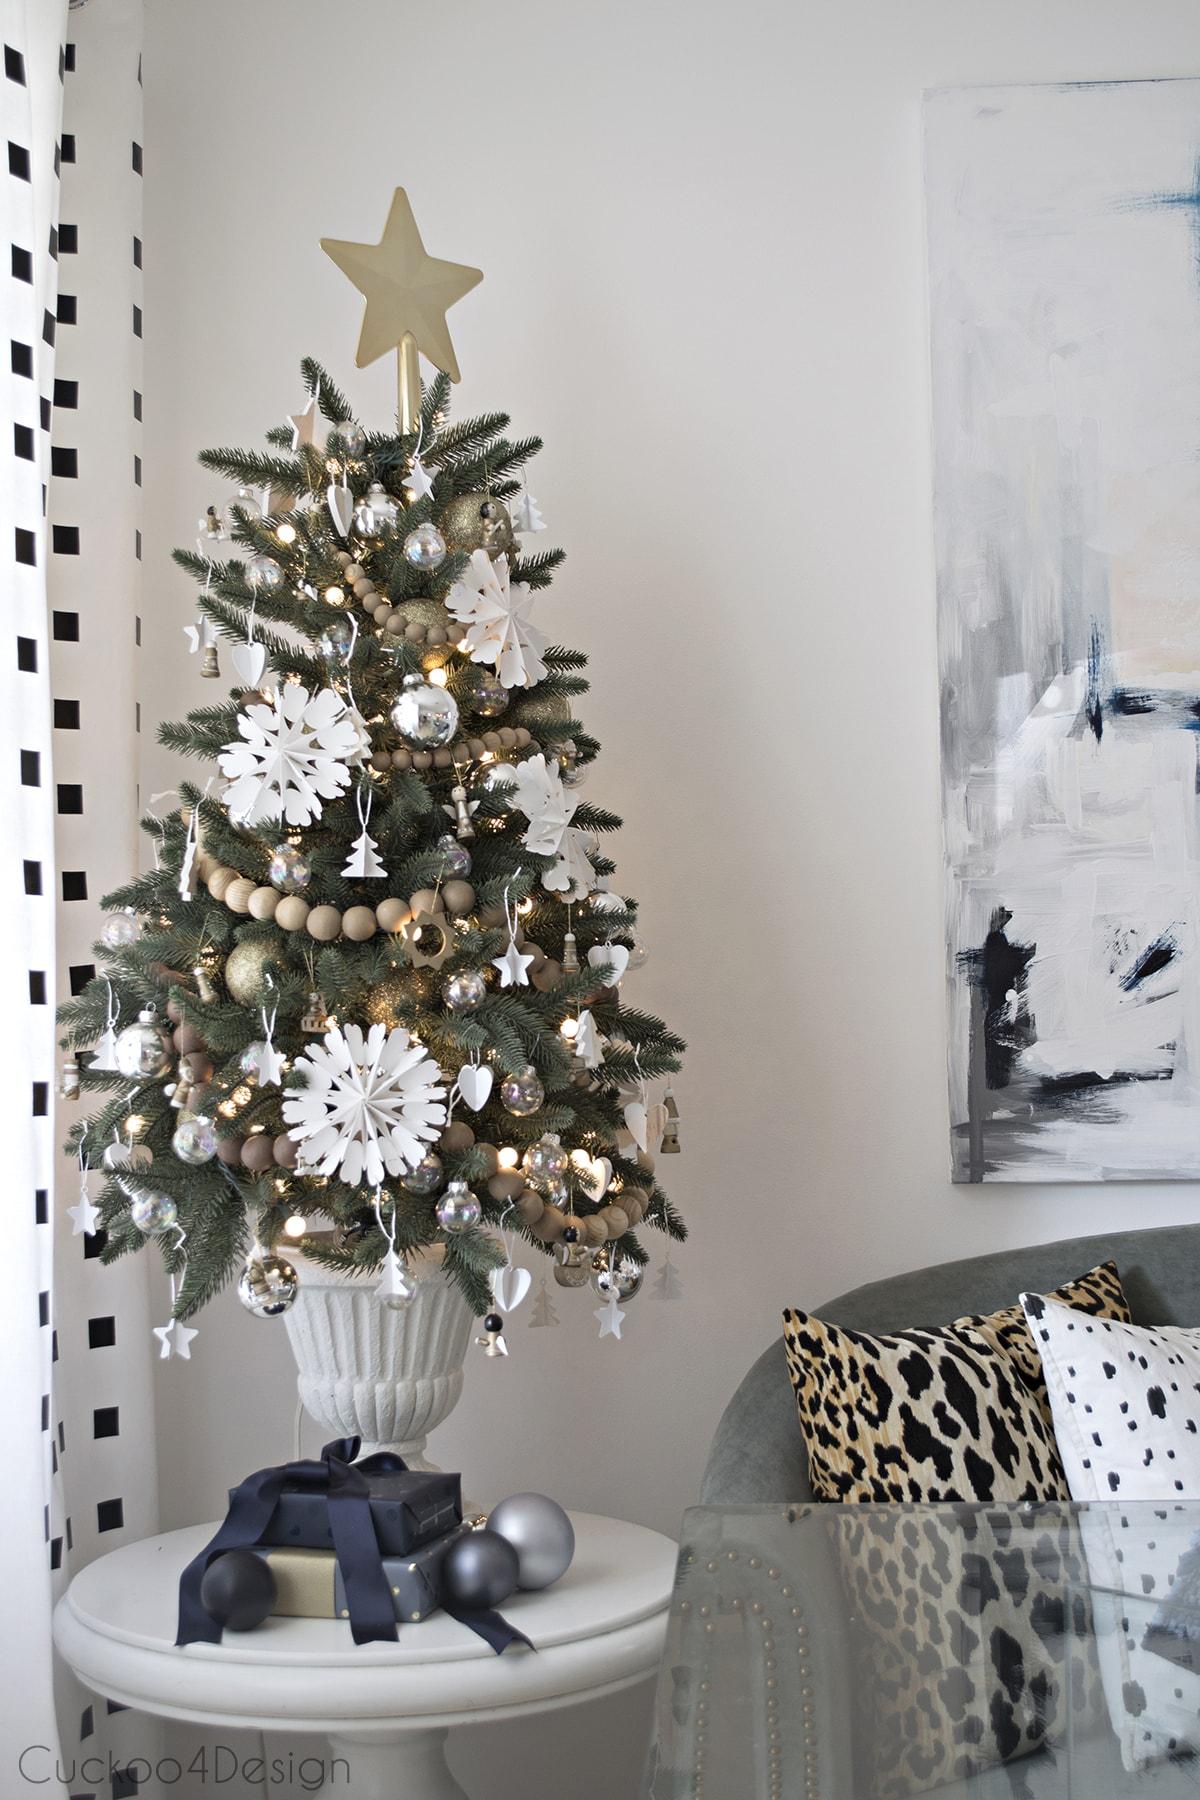 cuckoo4design_christmas_8